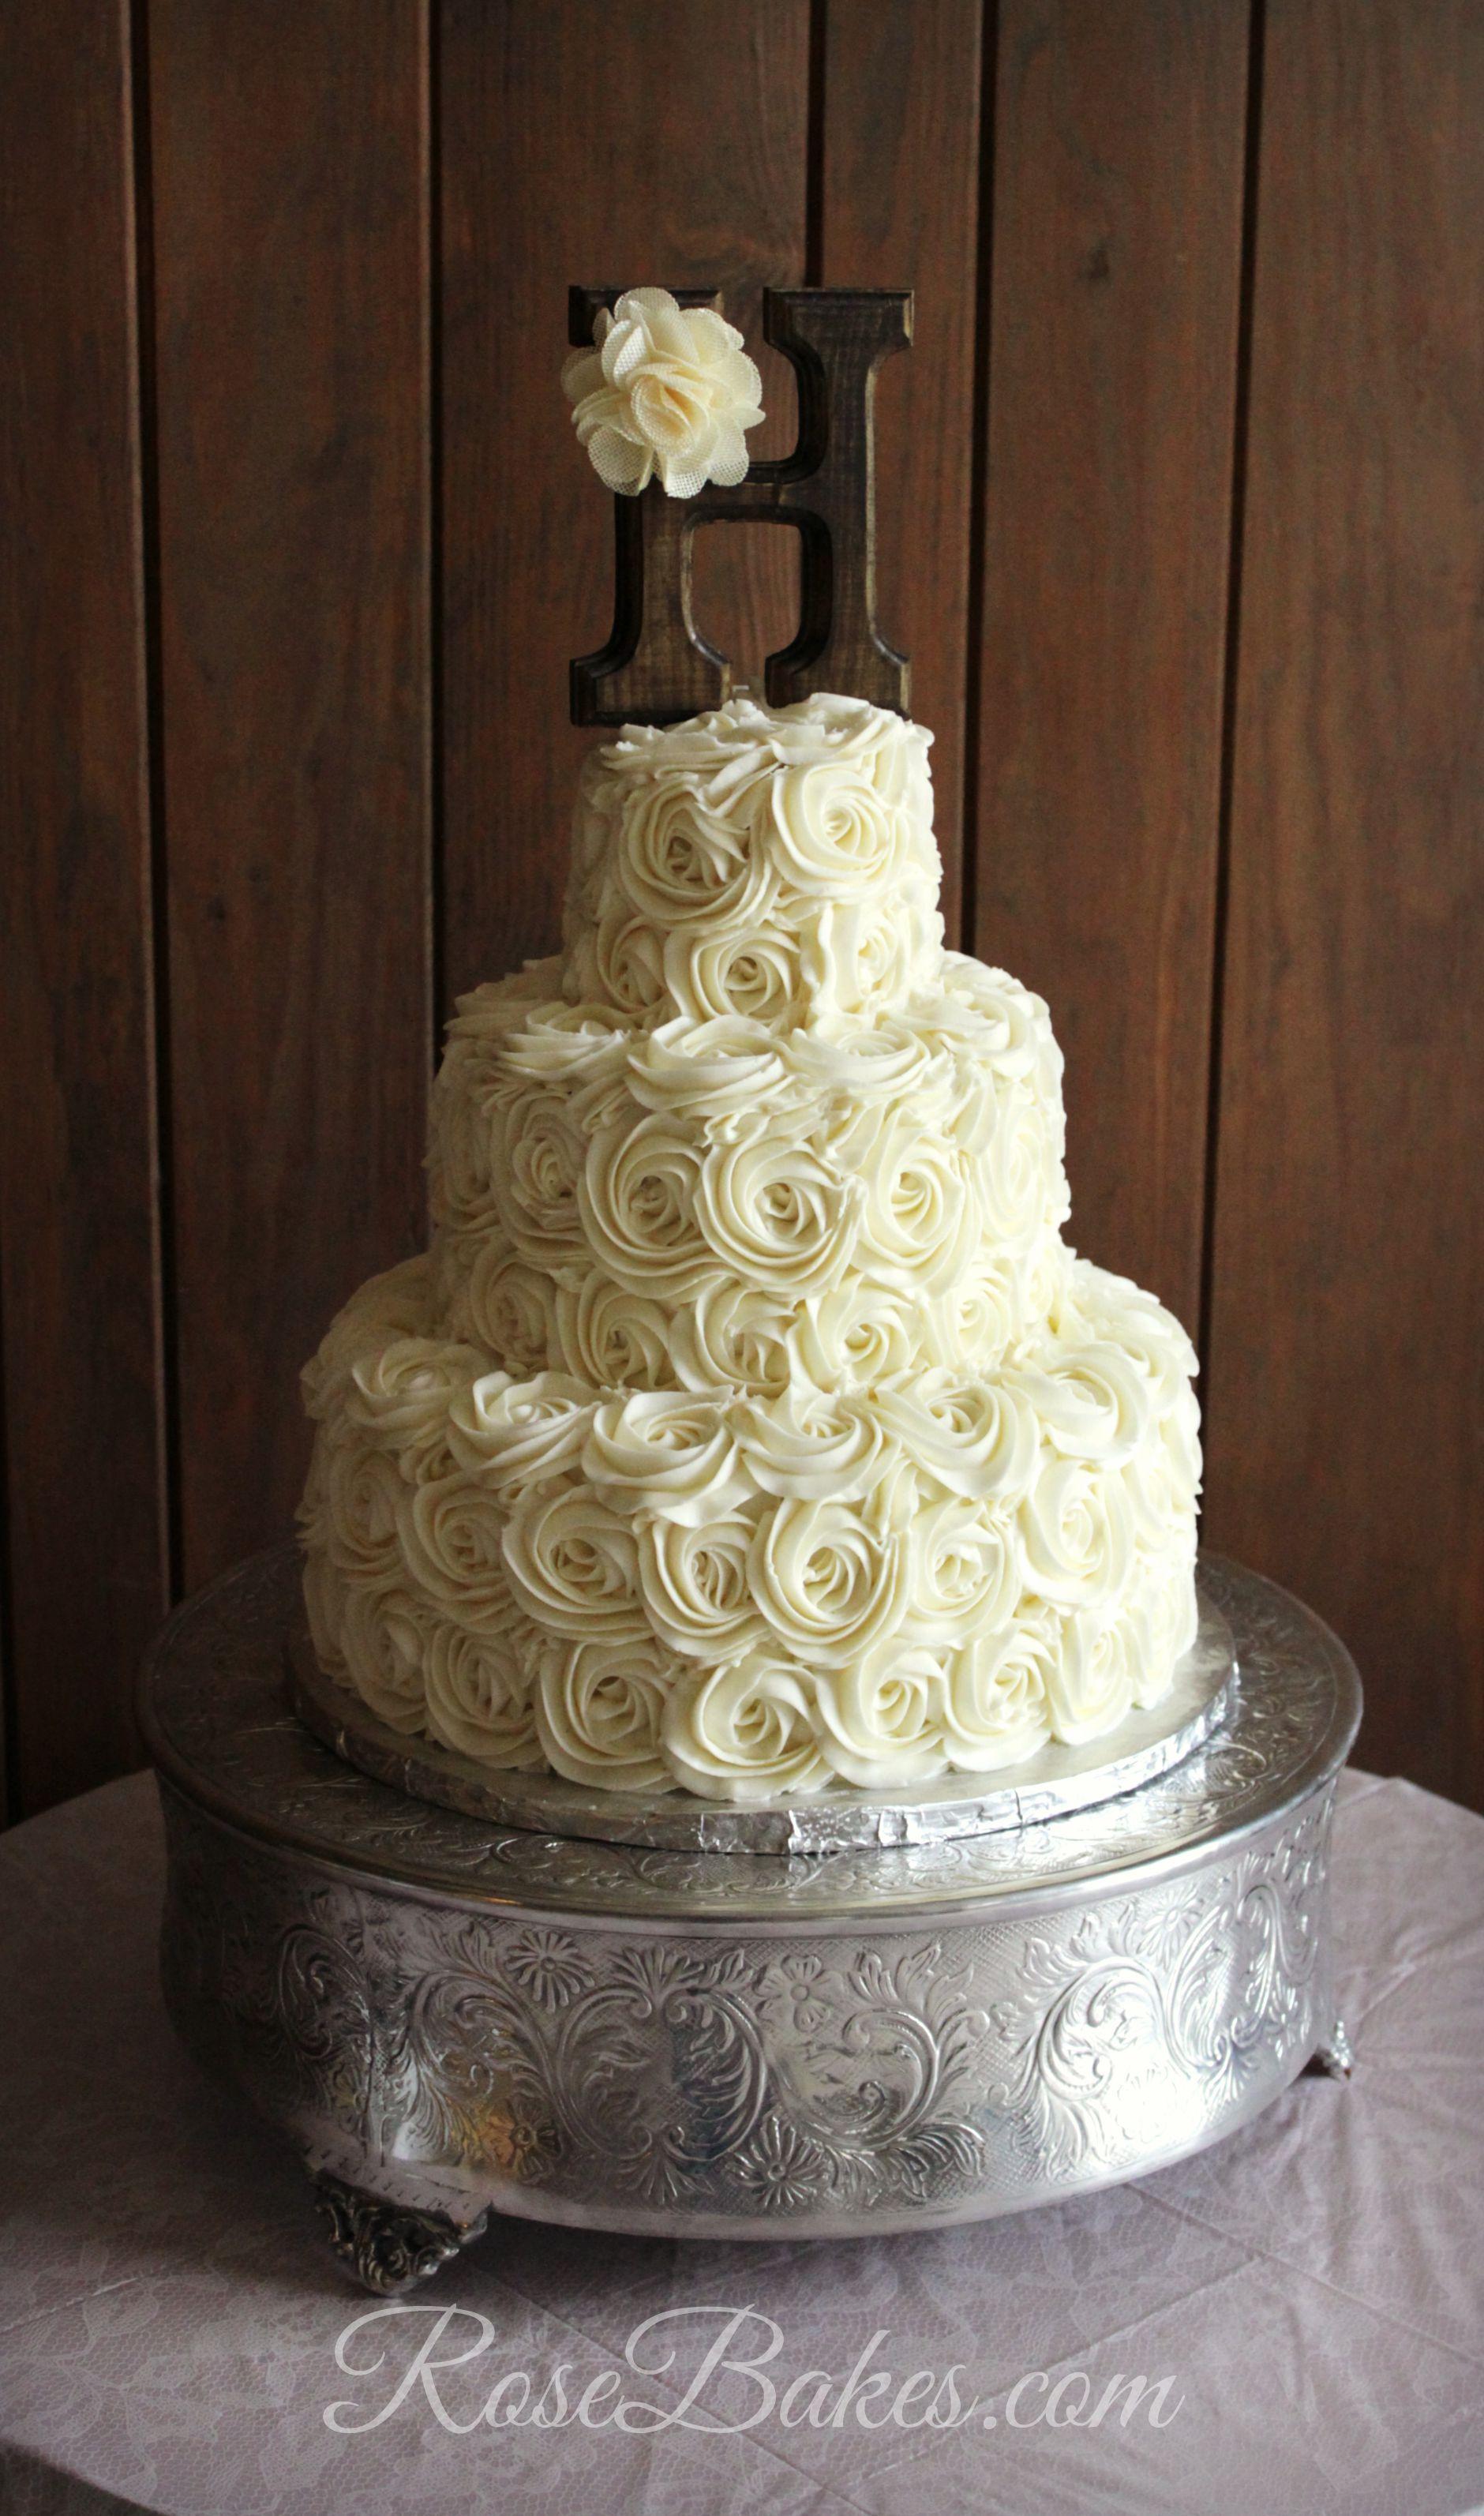 Rustic Buttercream Roses Wedding Cakae Wedding Cake Roses Rosette Cake Wedding Wedding Cake Rustic